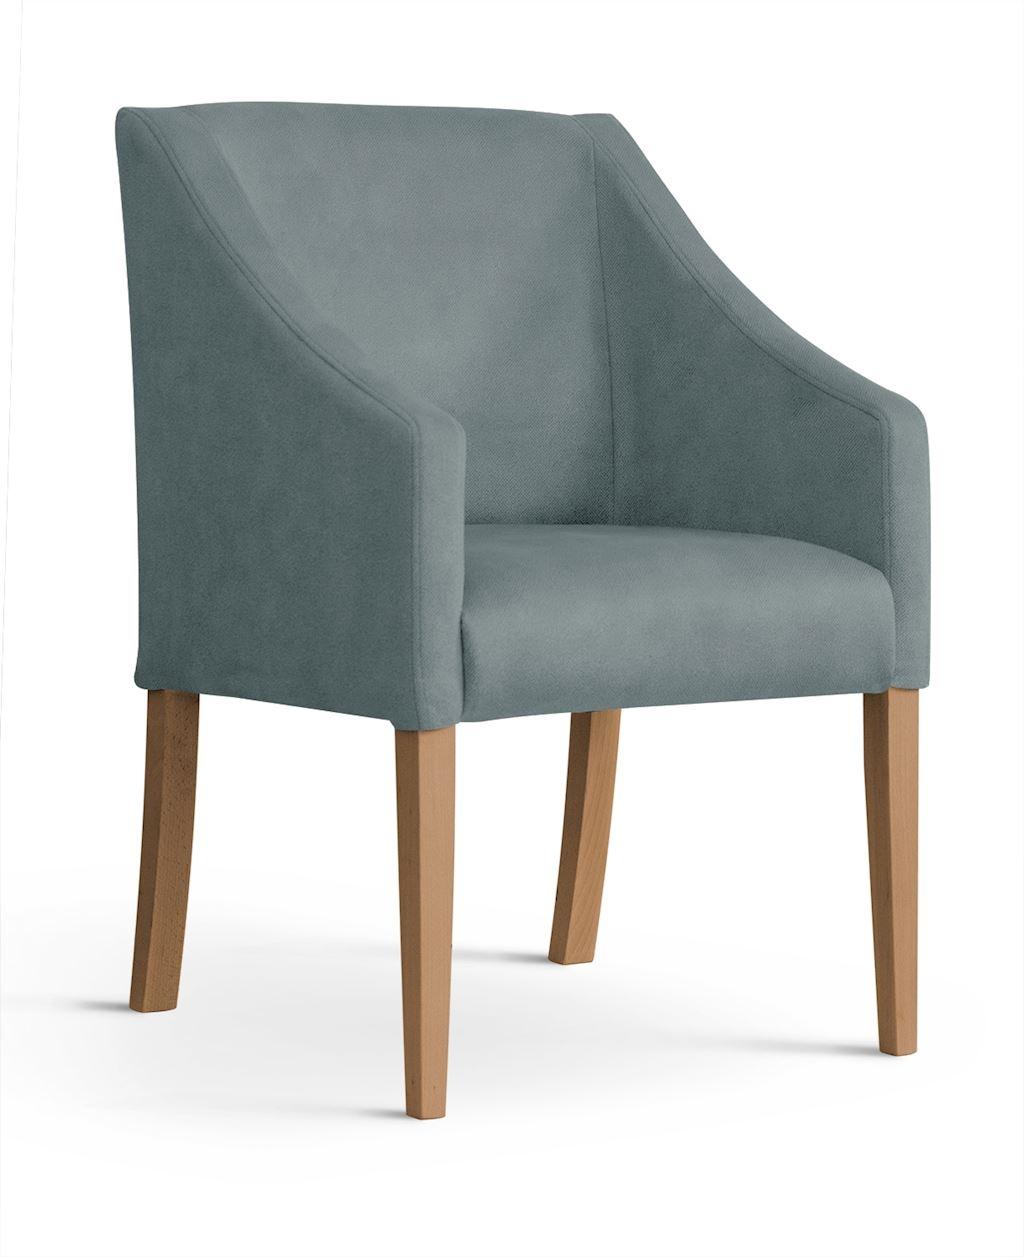 Fotoliu fix tapitat cu stofa, cu picioare din lemn Capri Grey / Oak, l58xA60xH89 cm